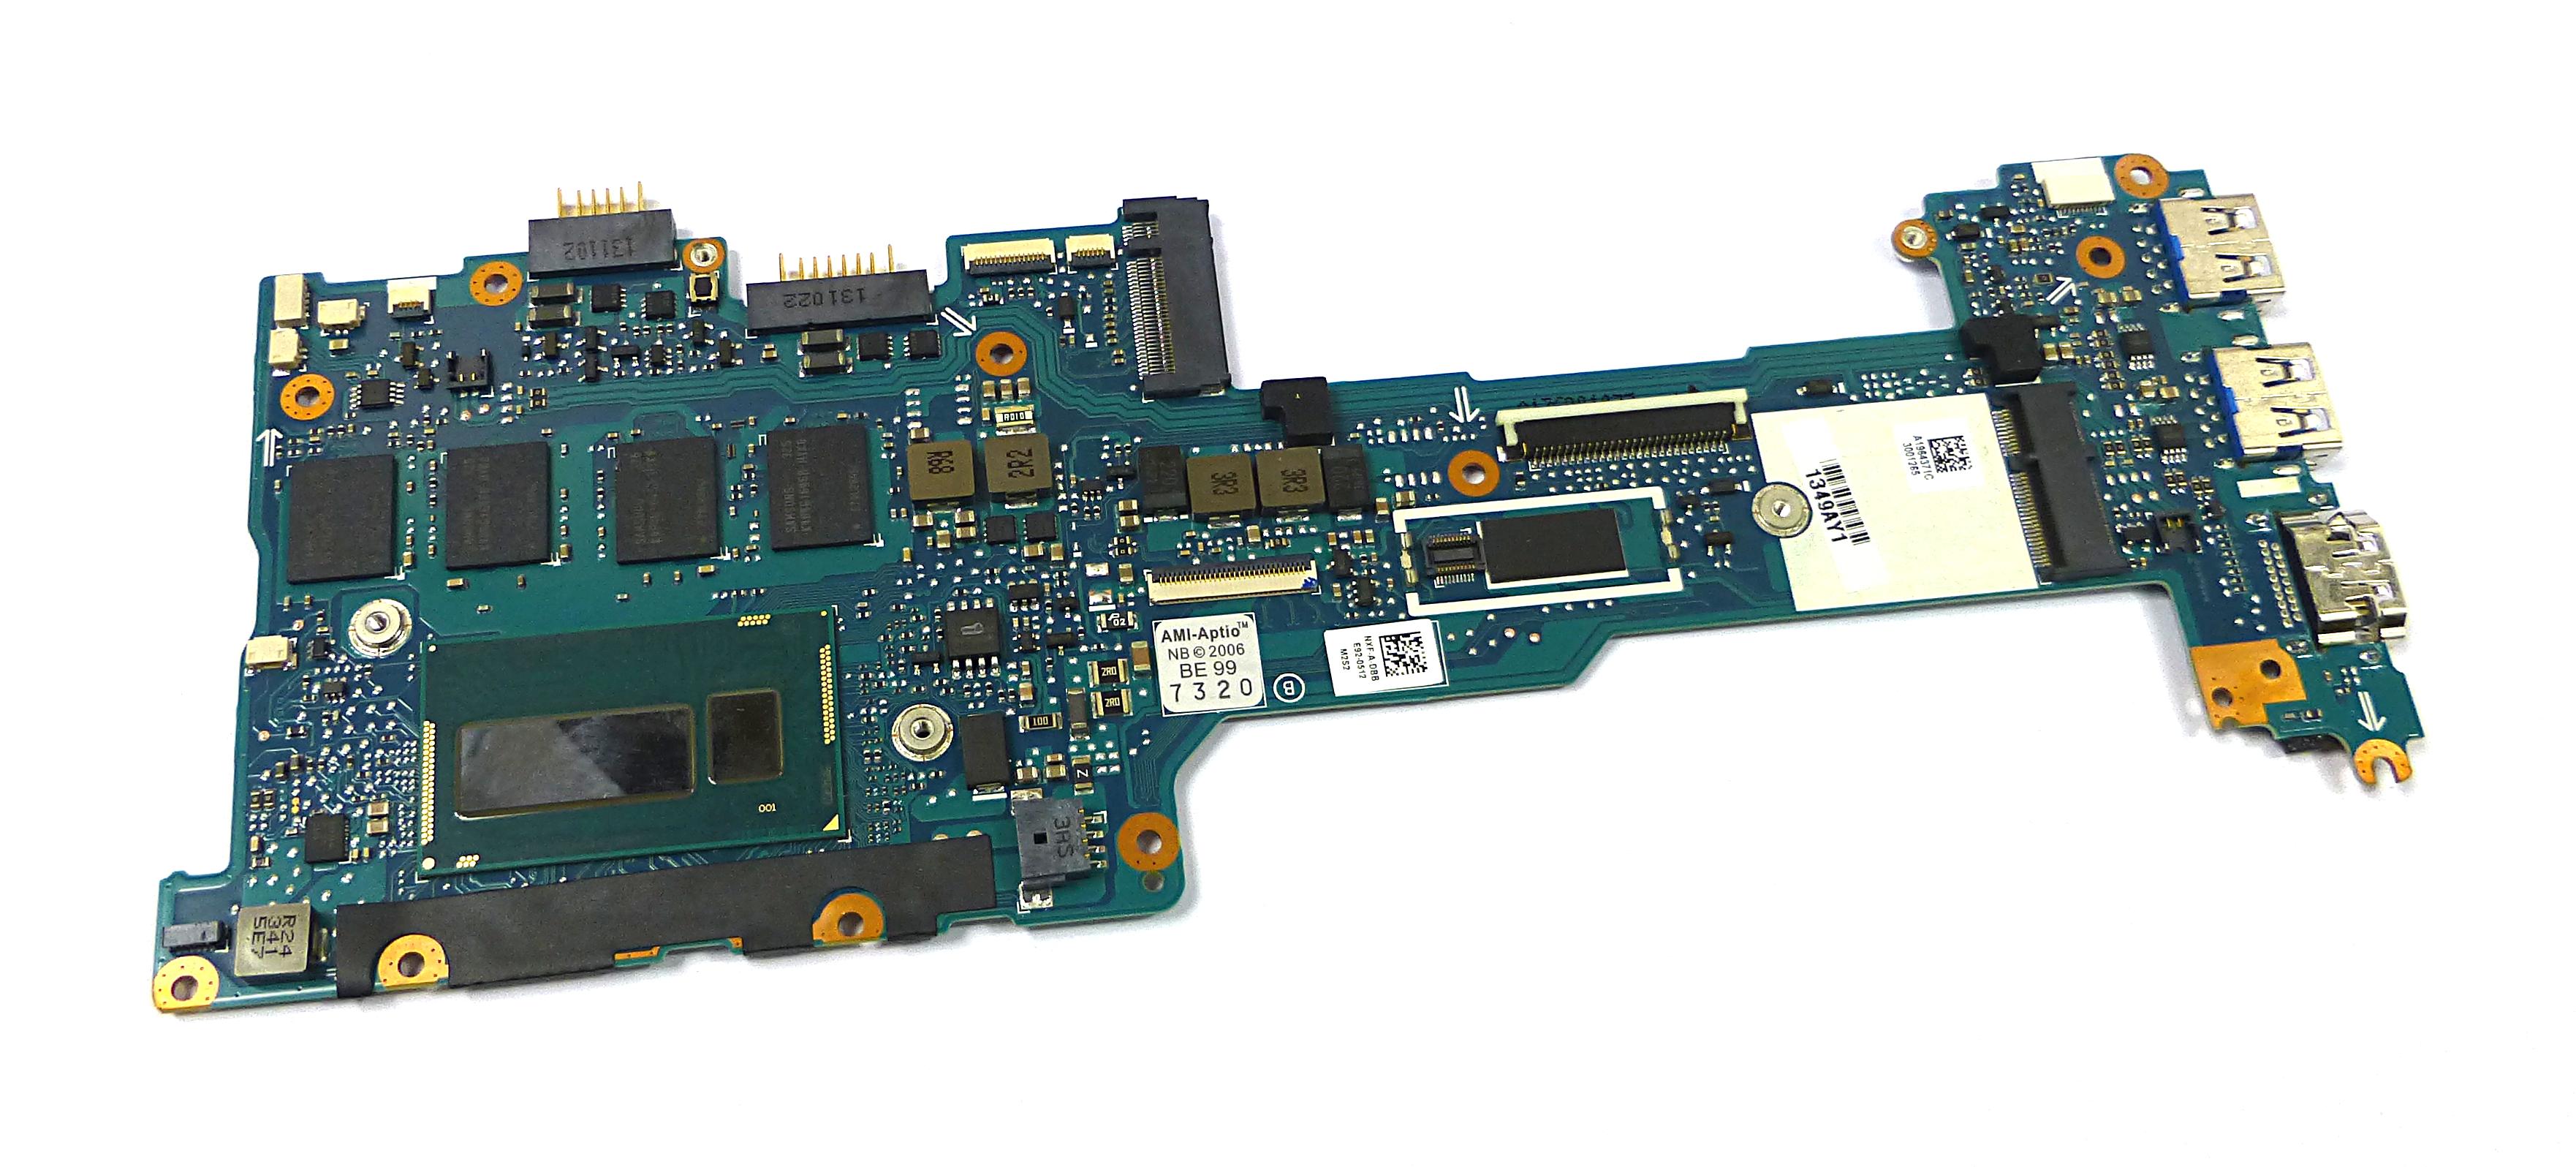 Sony A1964371C Laptop Motherboard with BGA Intel SR170 Processor